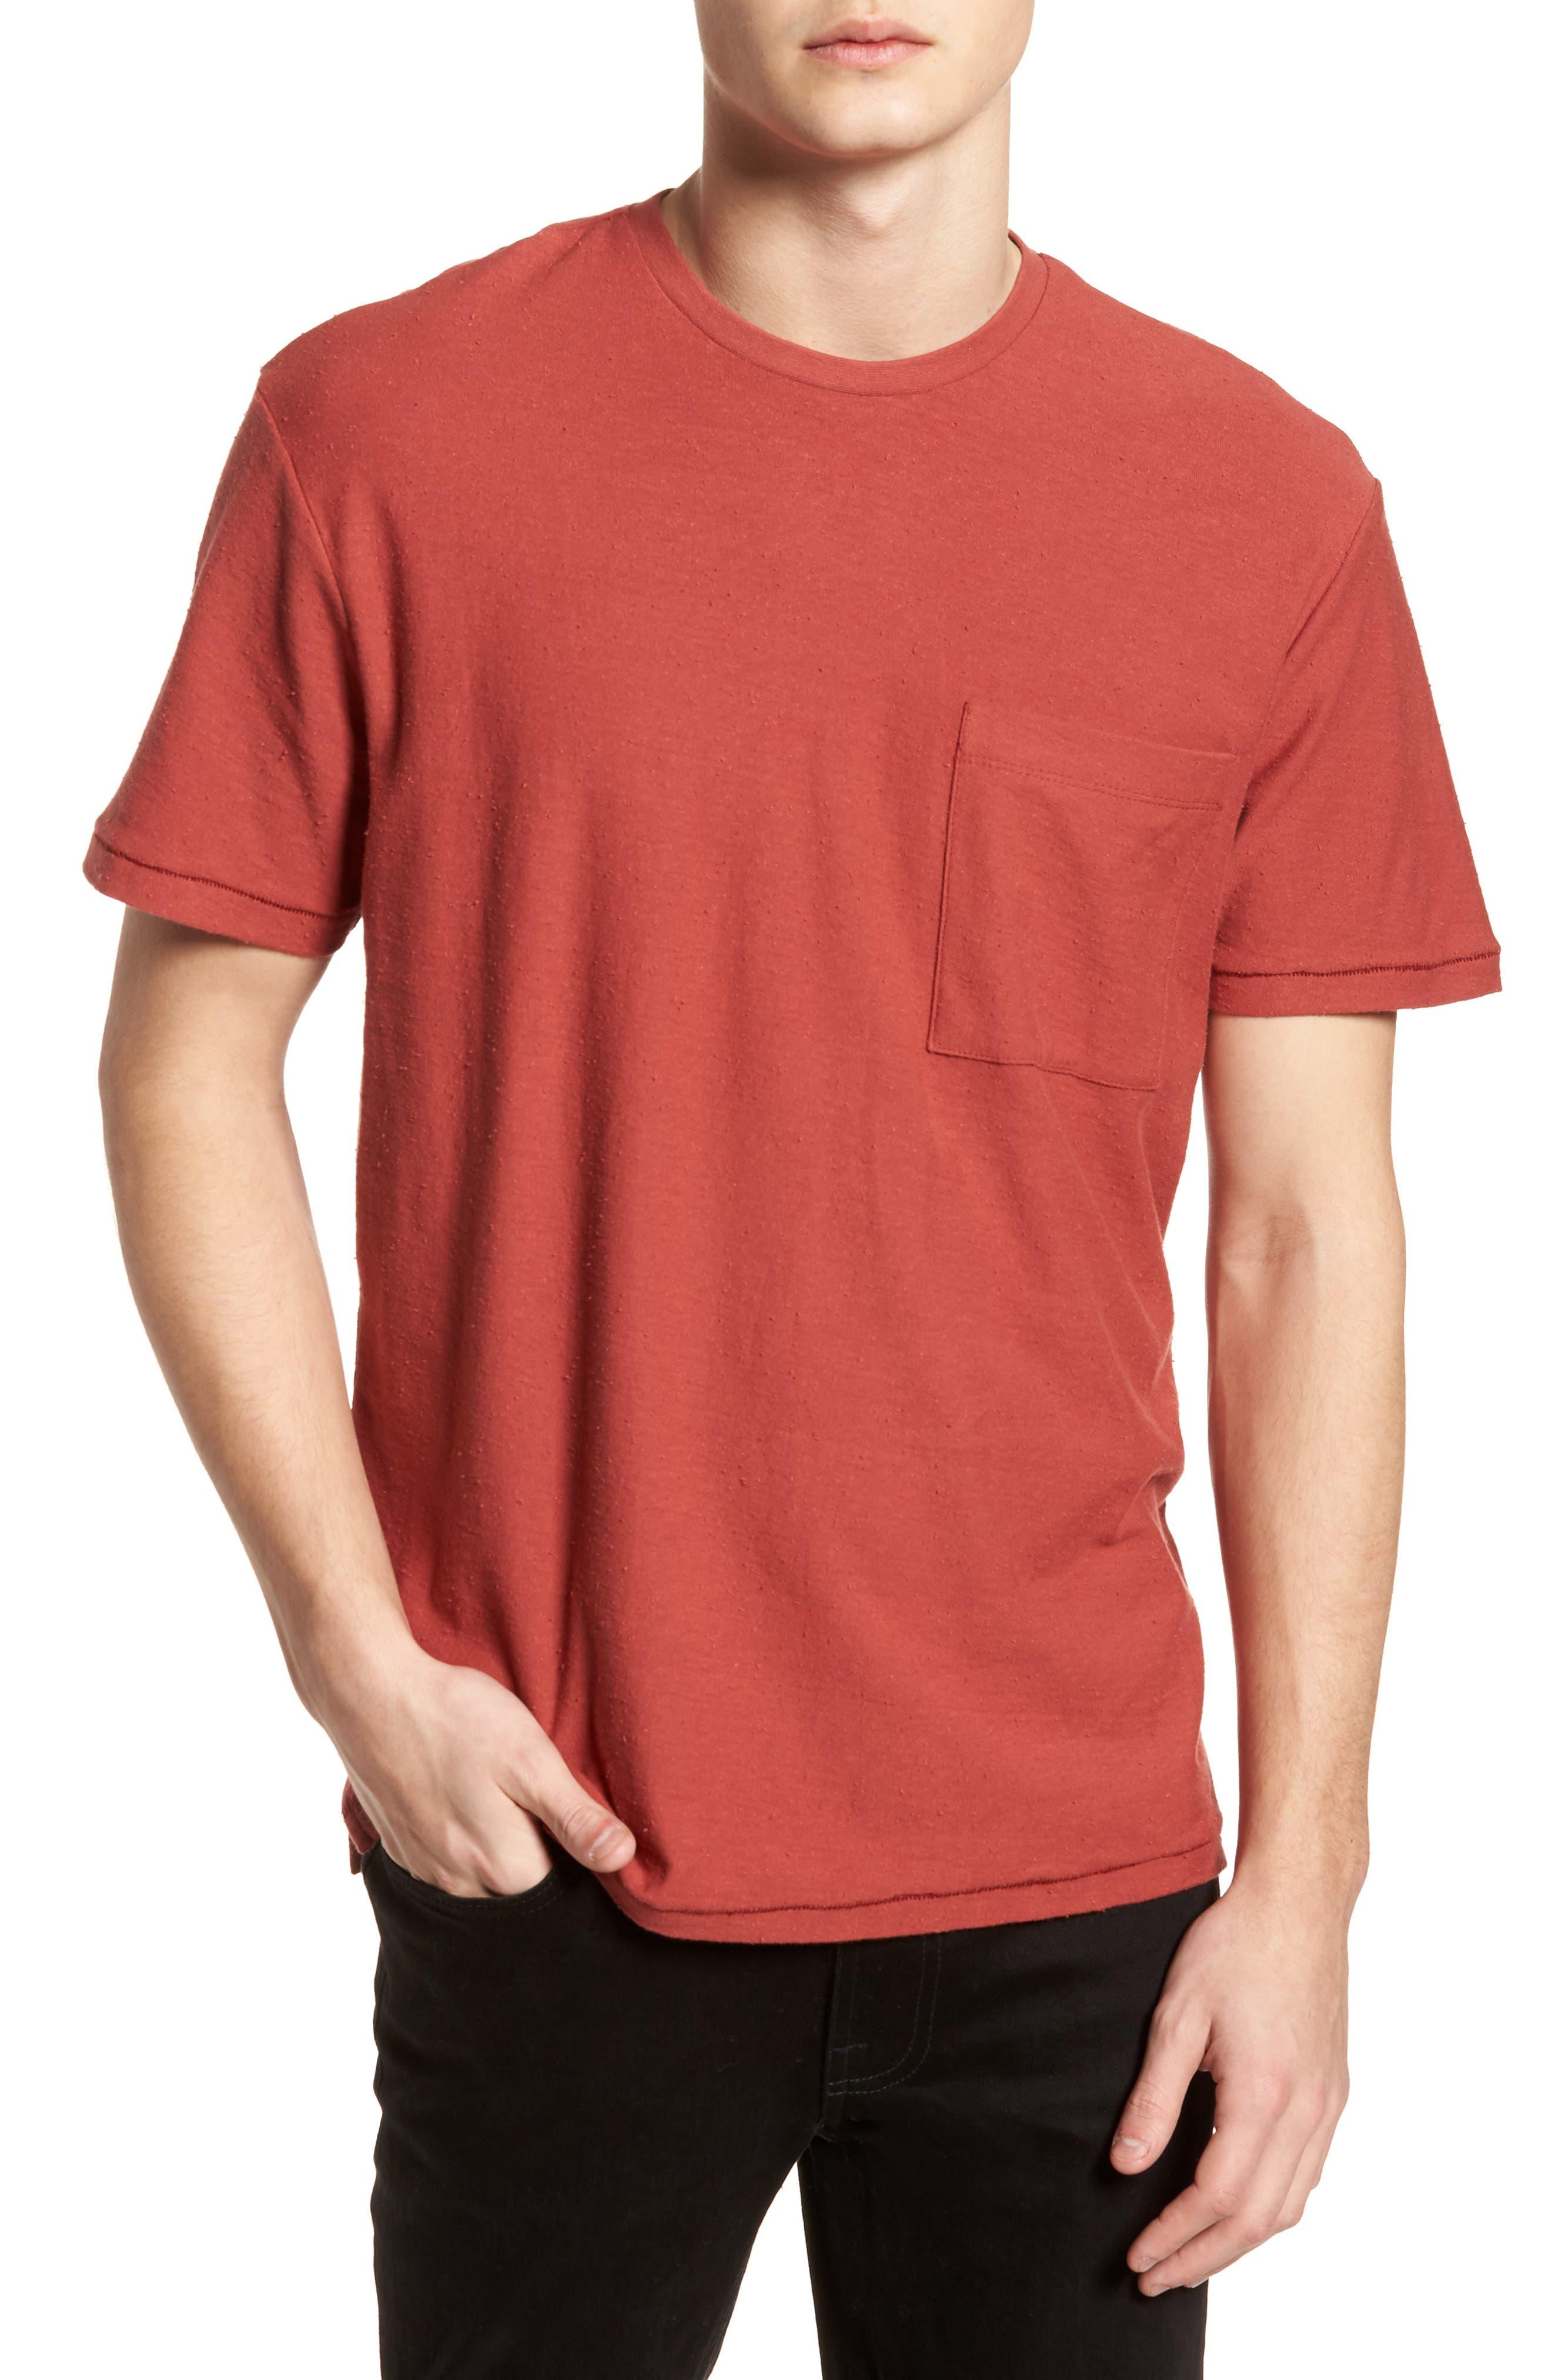 Nep Cotton Pocket T-Shirt,                             Main thumbnail 1, color,                             221